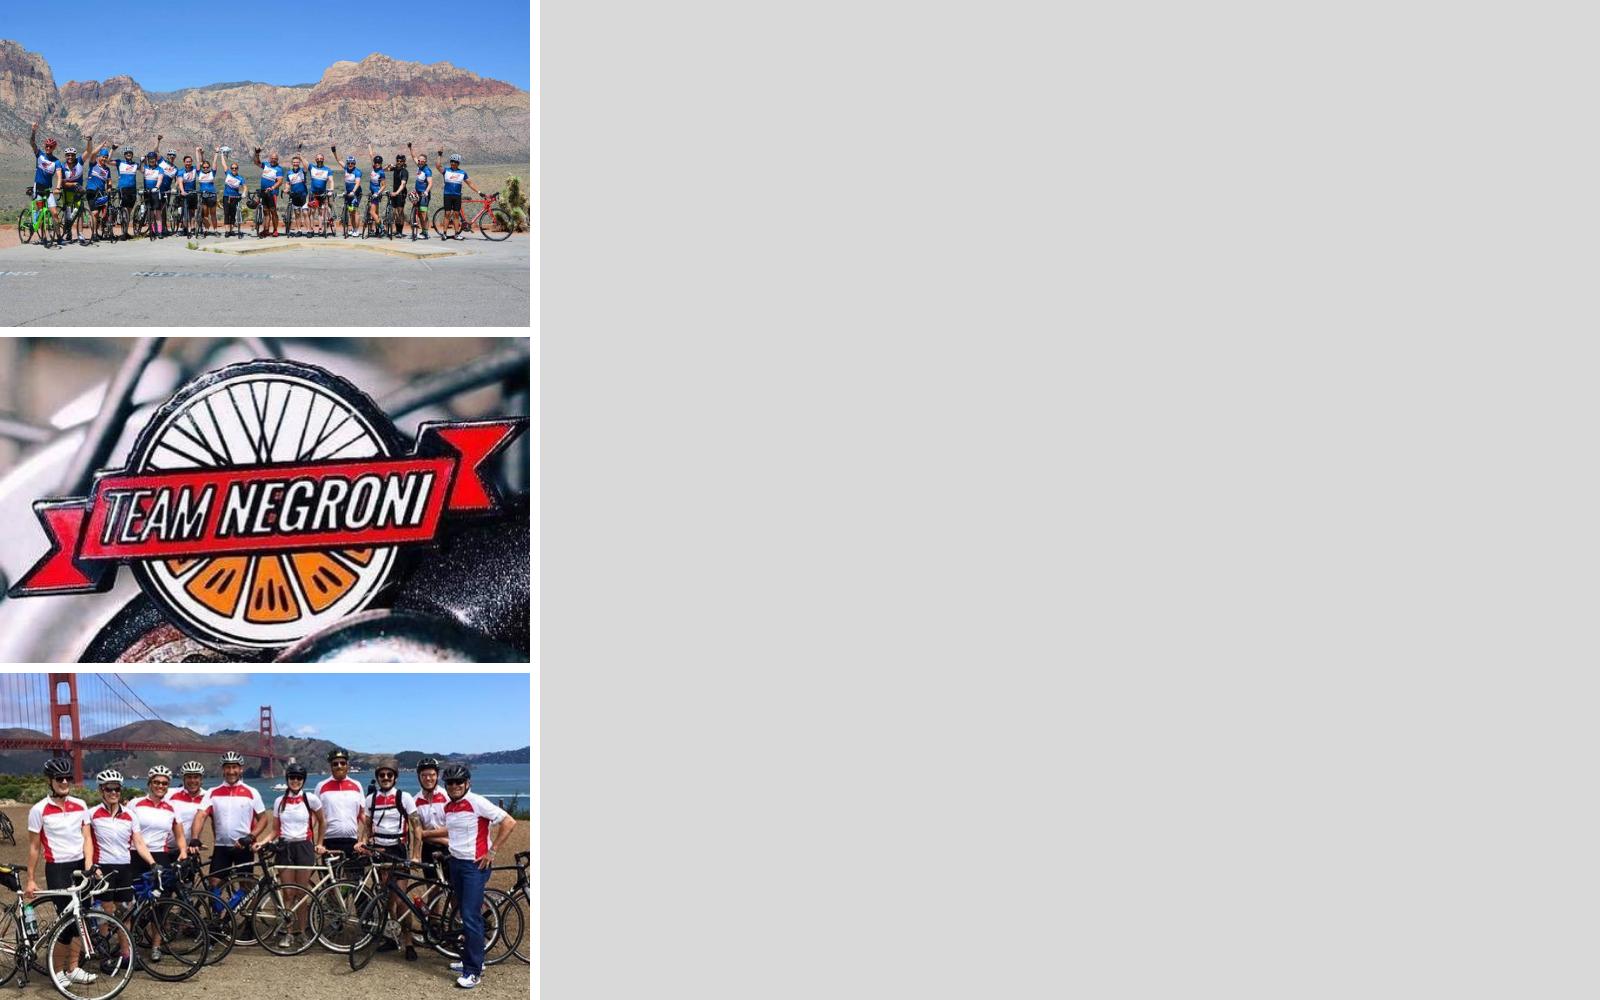 Team Negroni 2019 Registration image